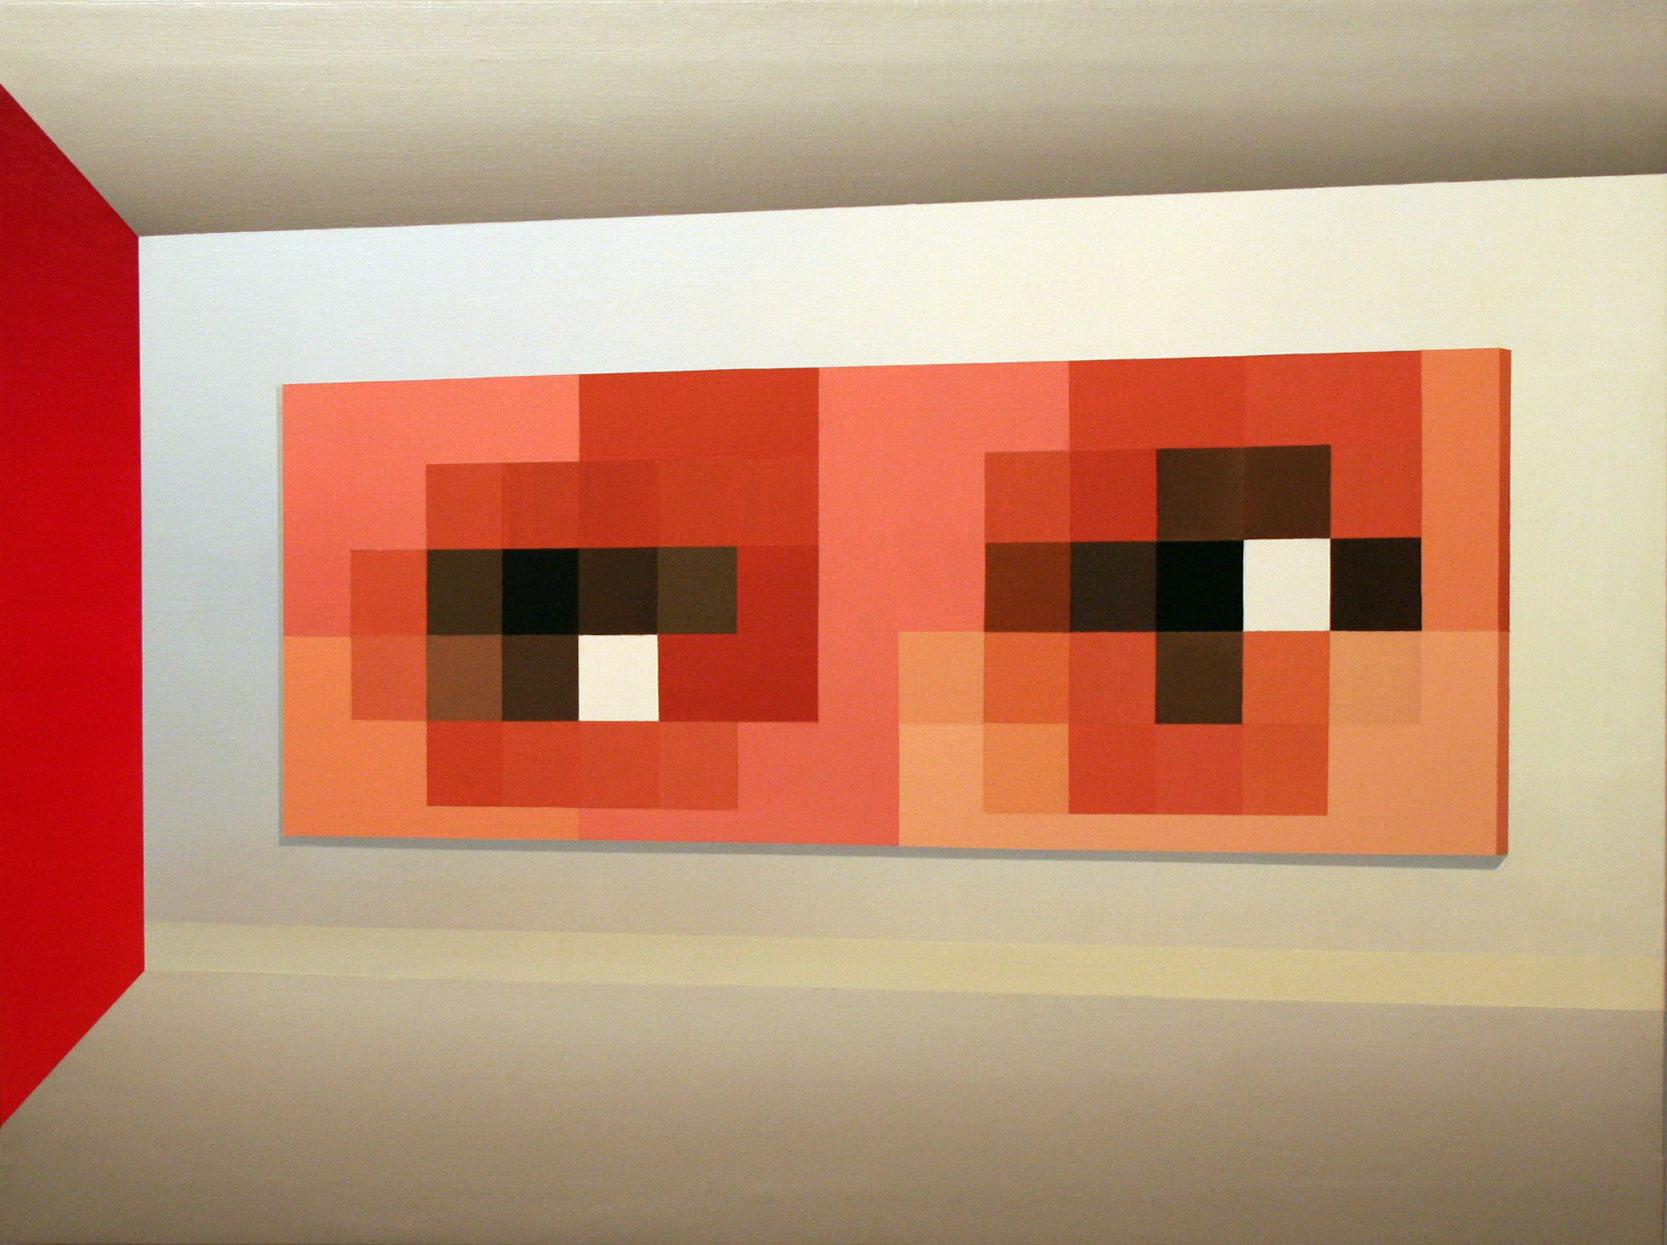 Mis ojos marrones (2007) - Illán Argüello